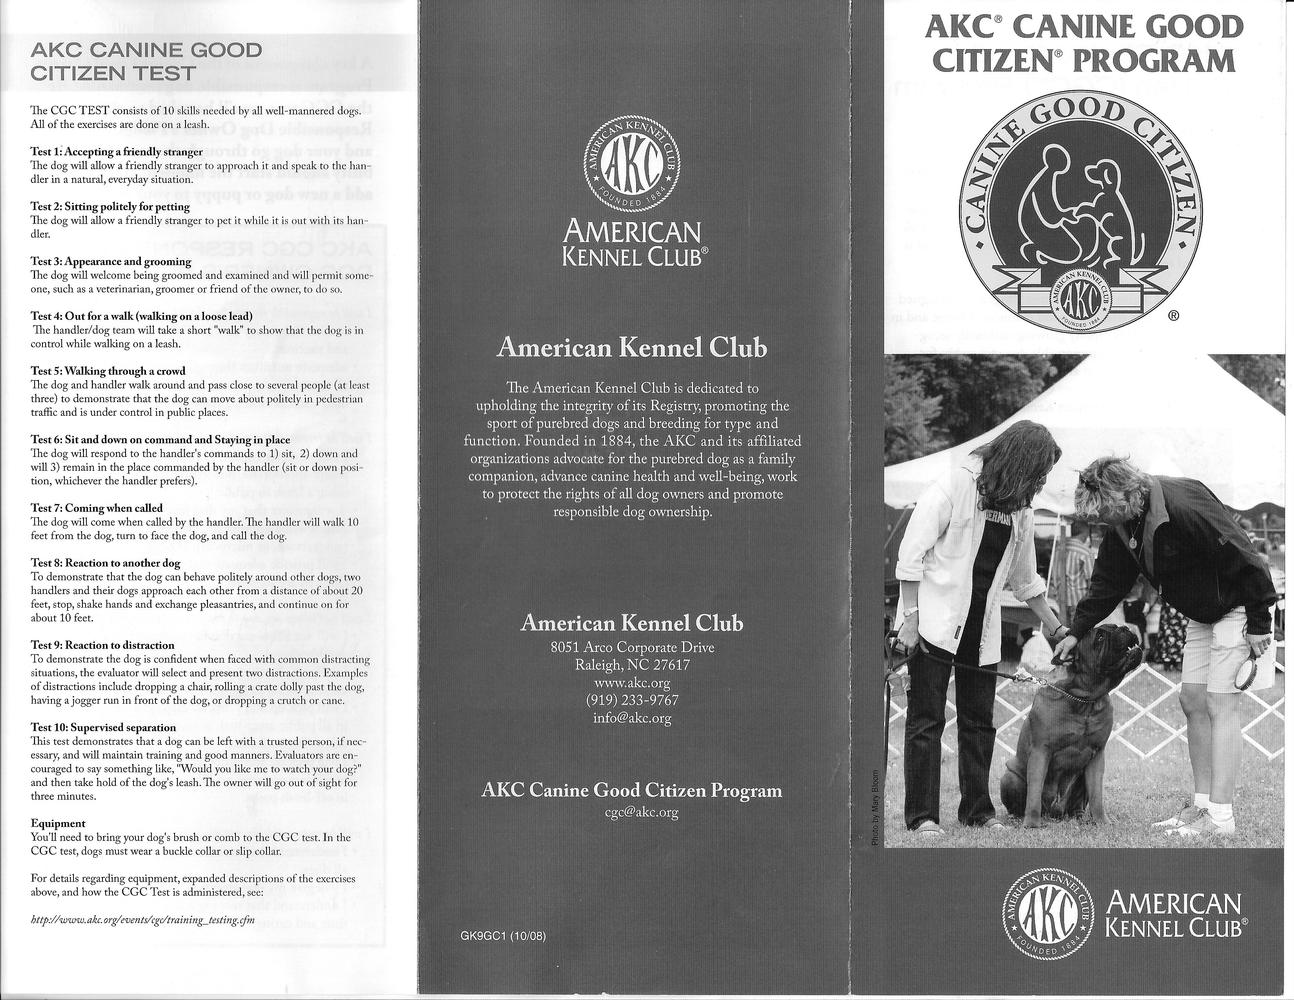 AKC Canine Good Citizen Program.png